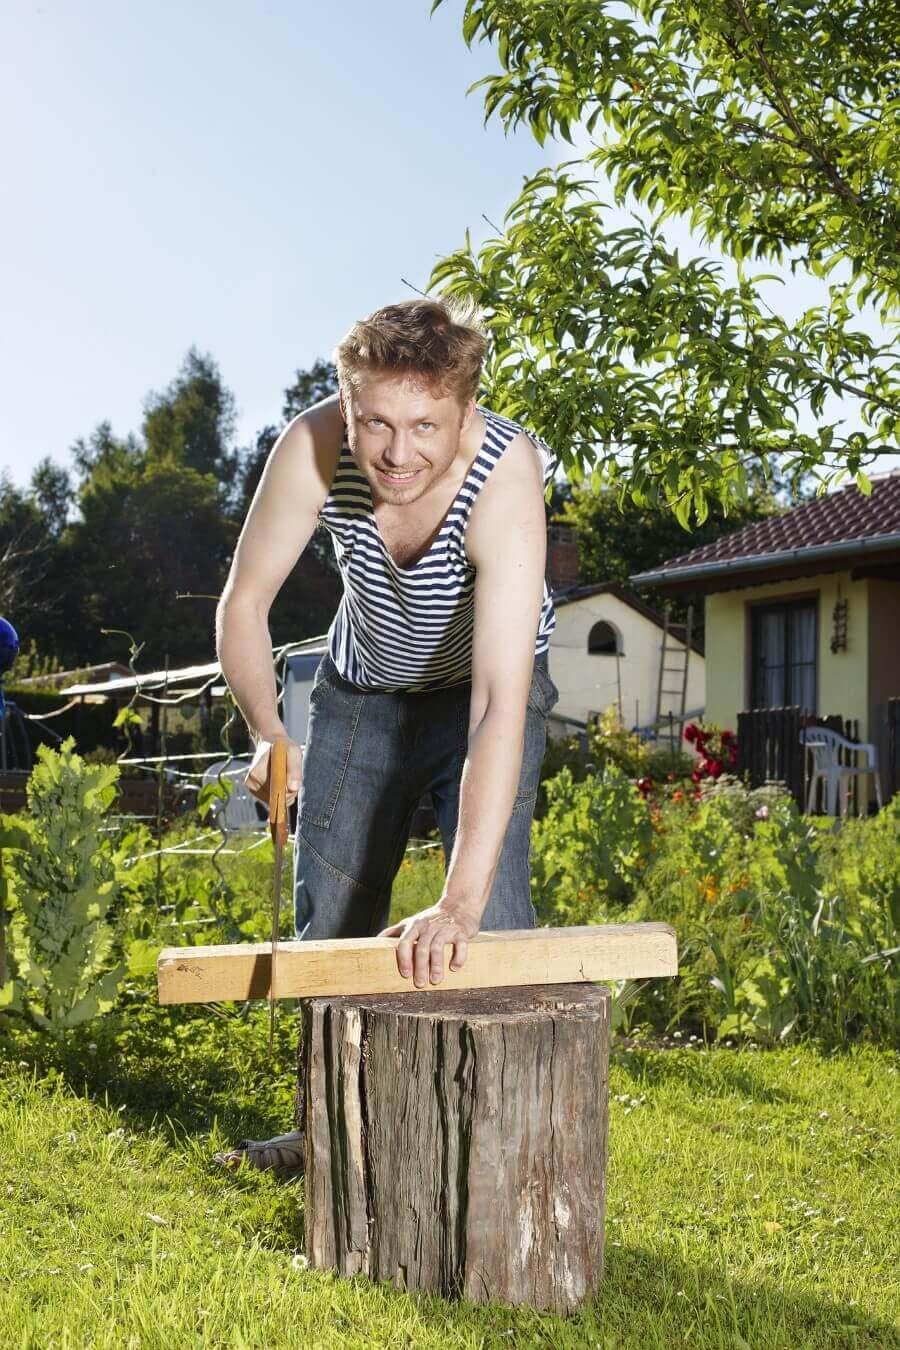 man cutting a piece of wood using a saw